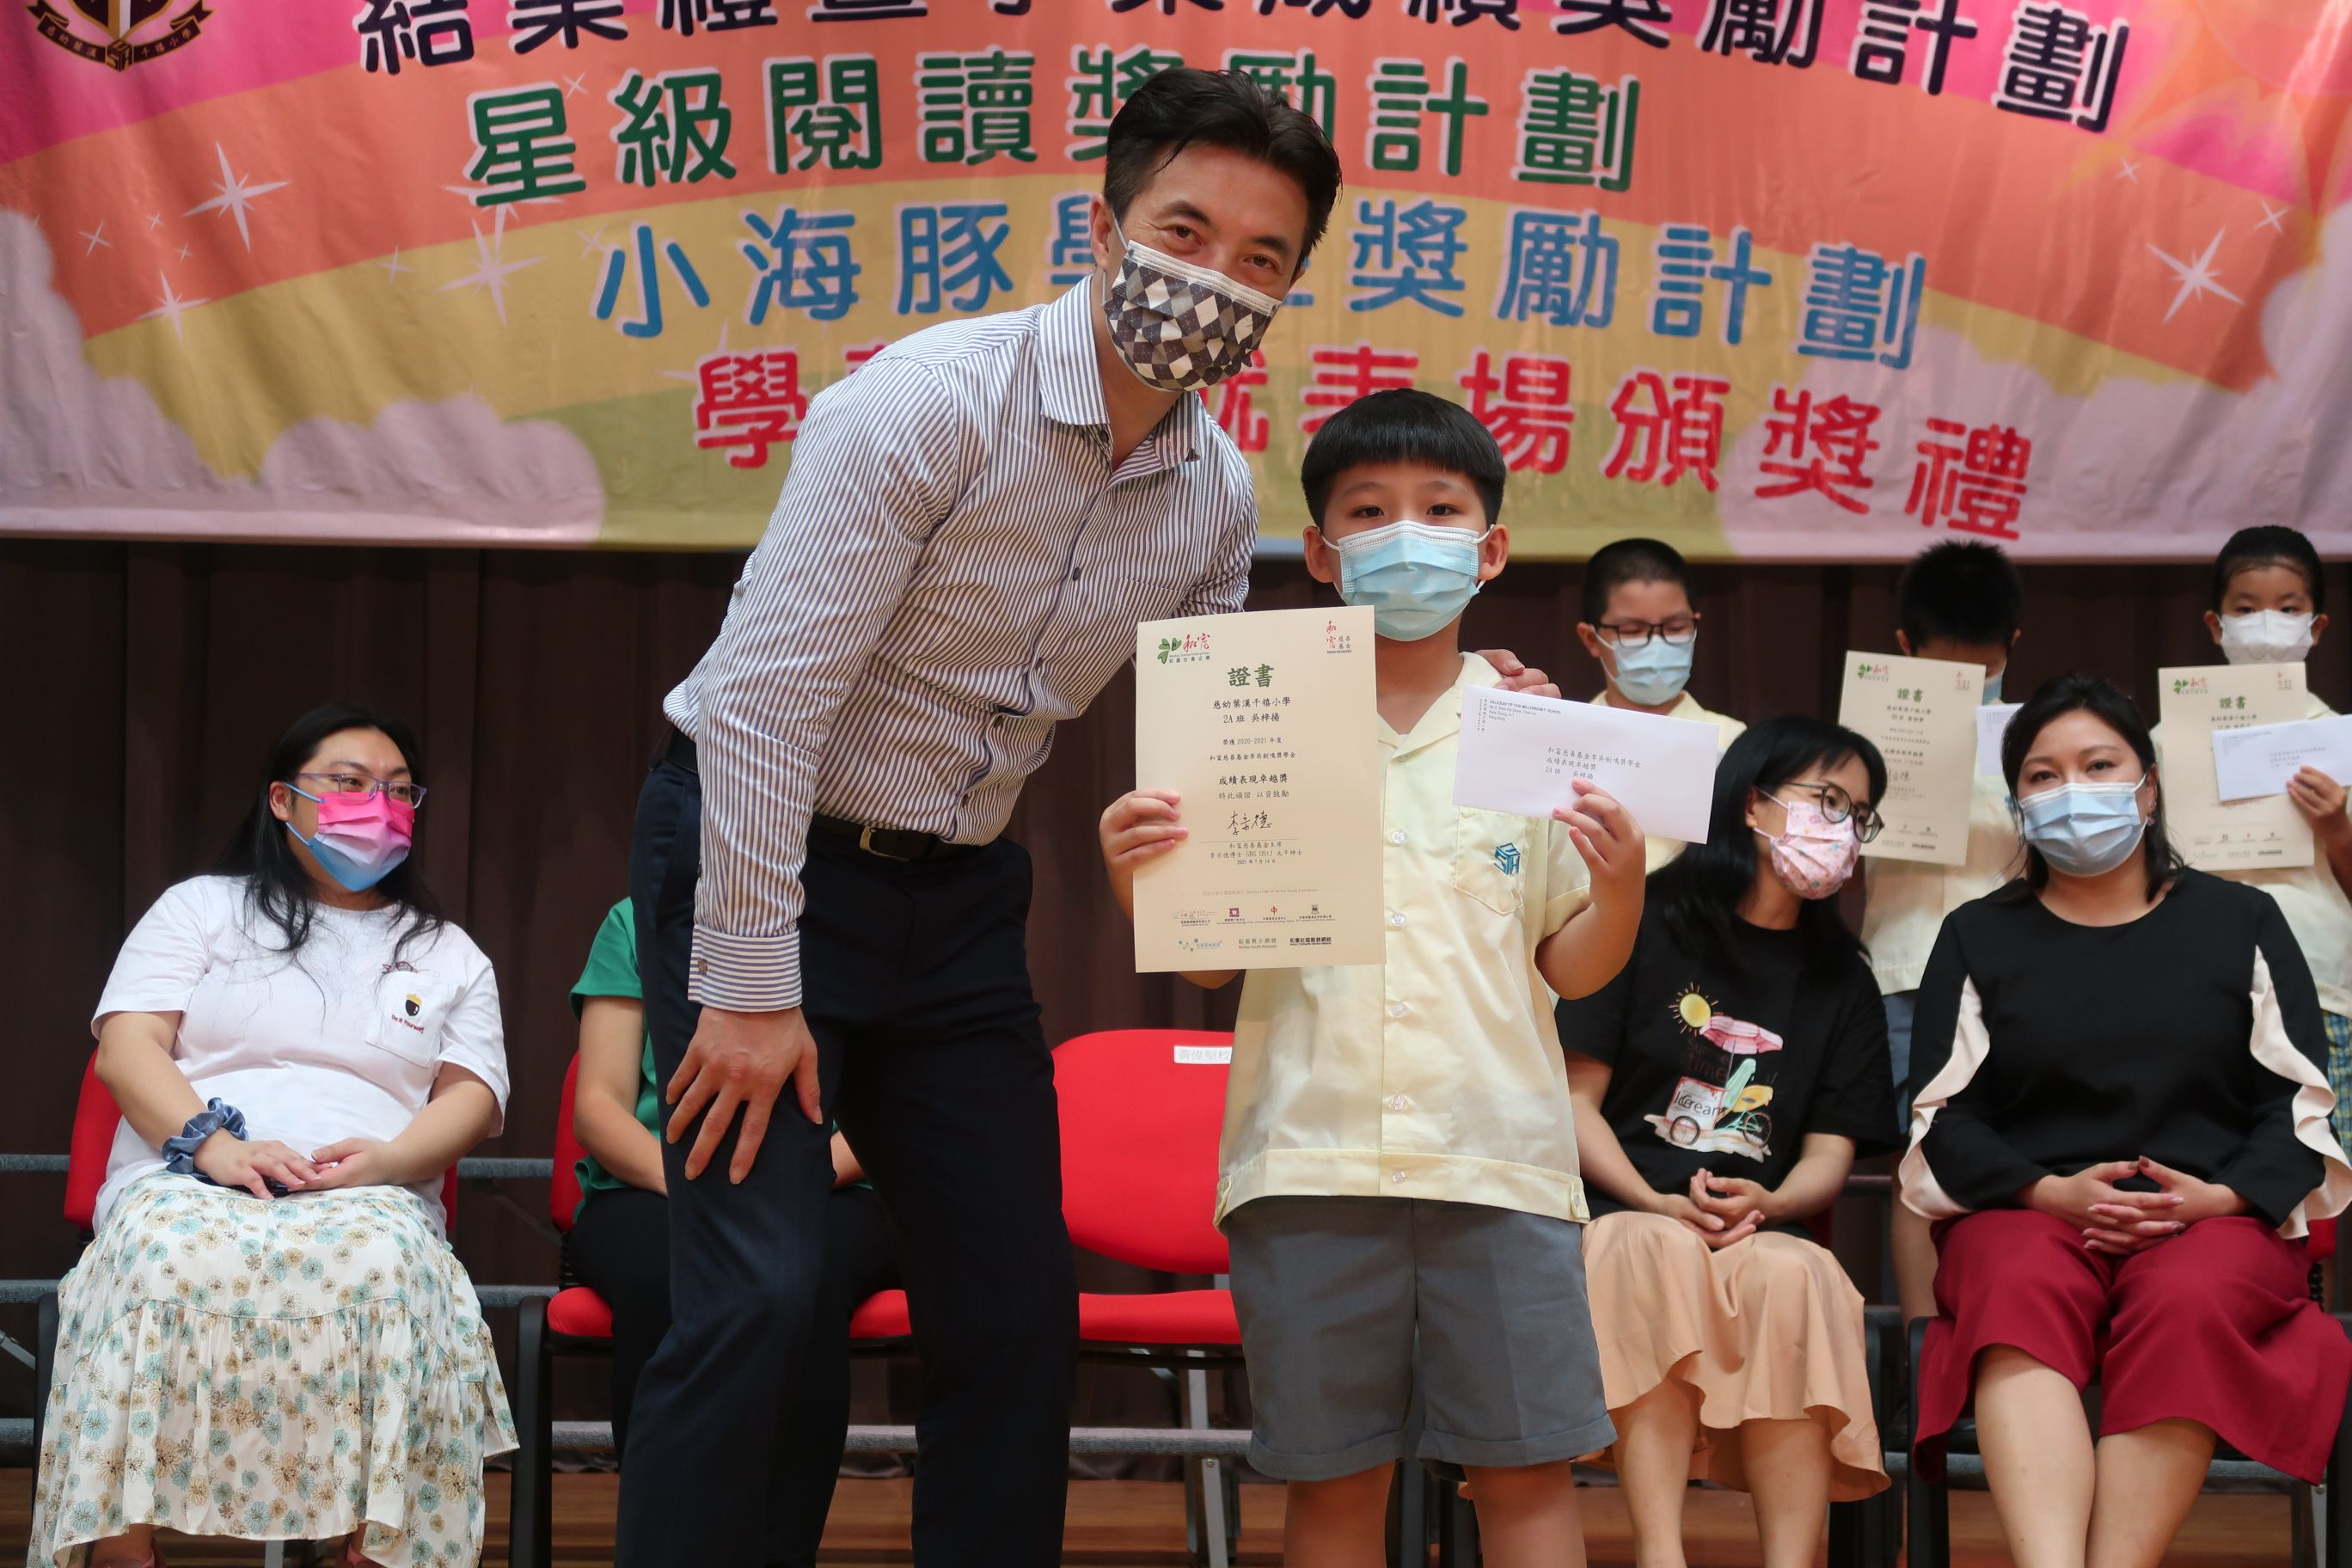 https://syh.edu.hk/sites/default/files/img_5932_1.jpg